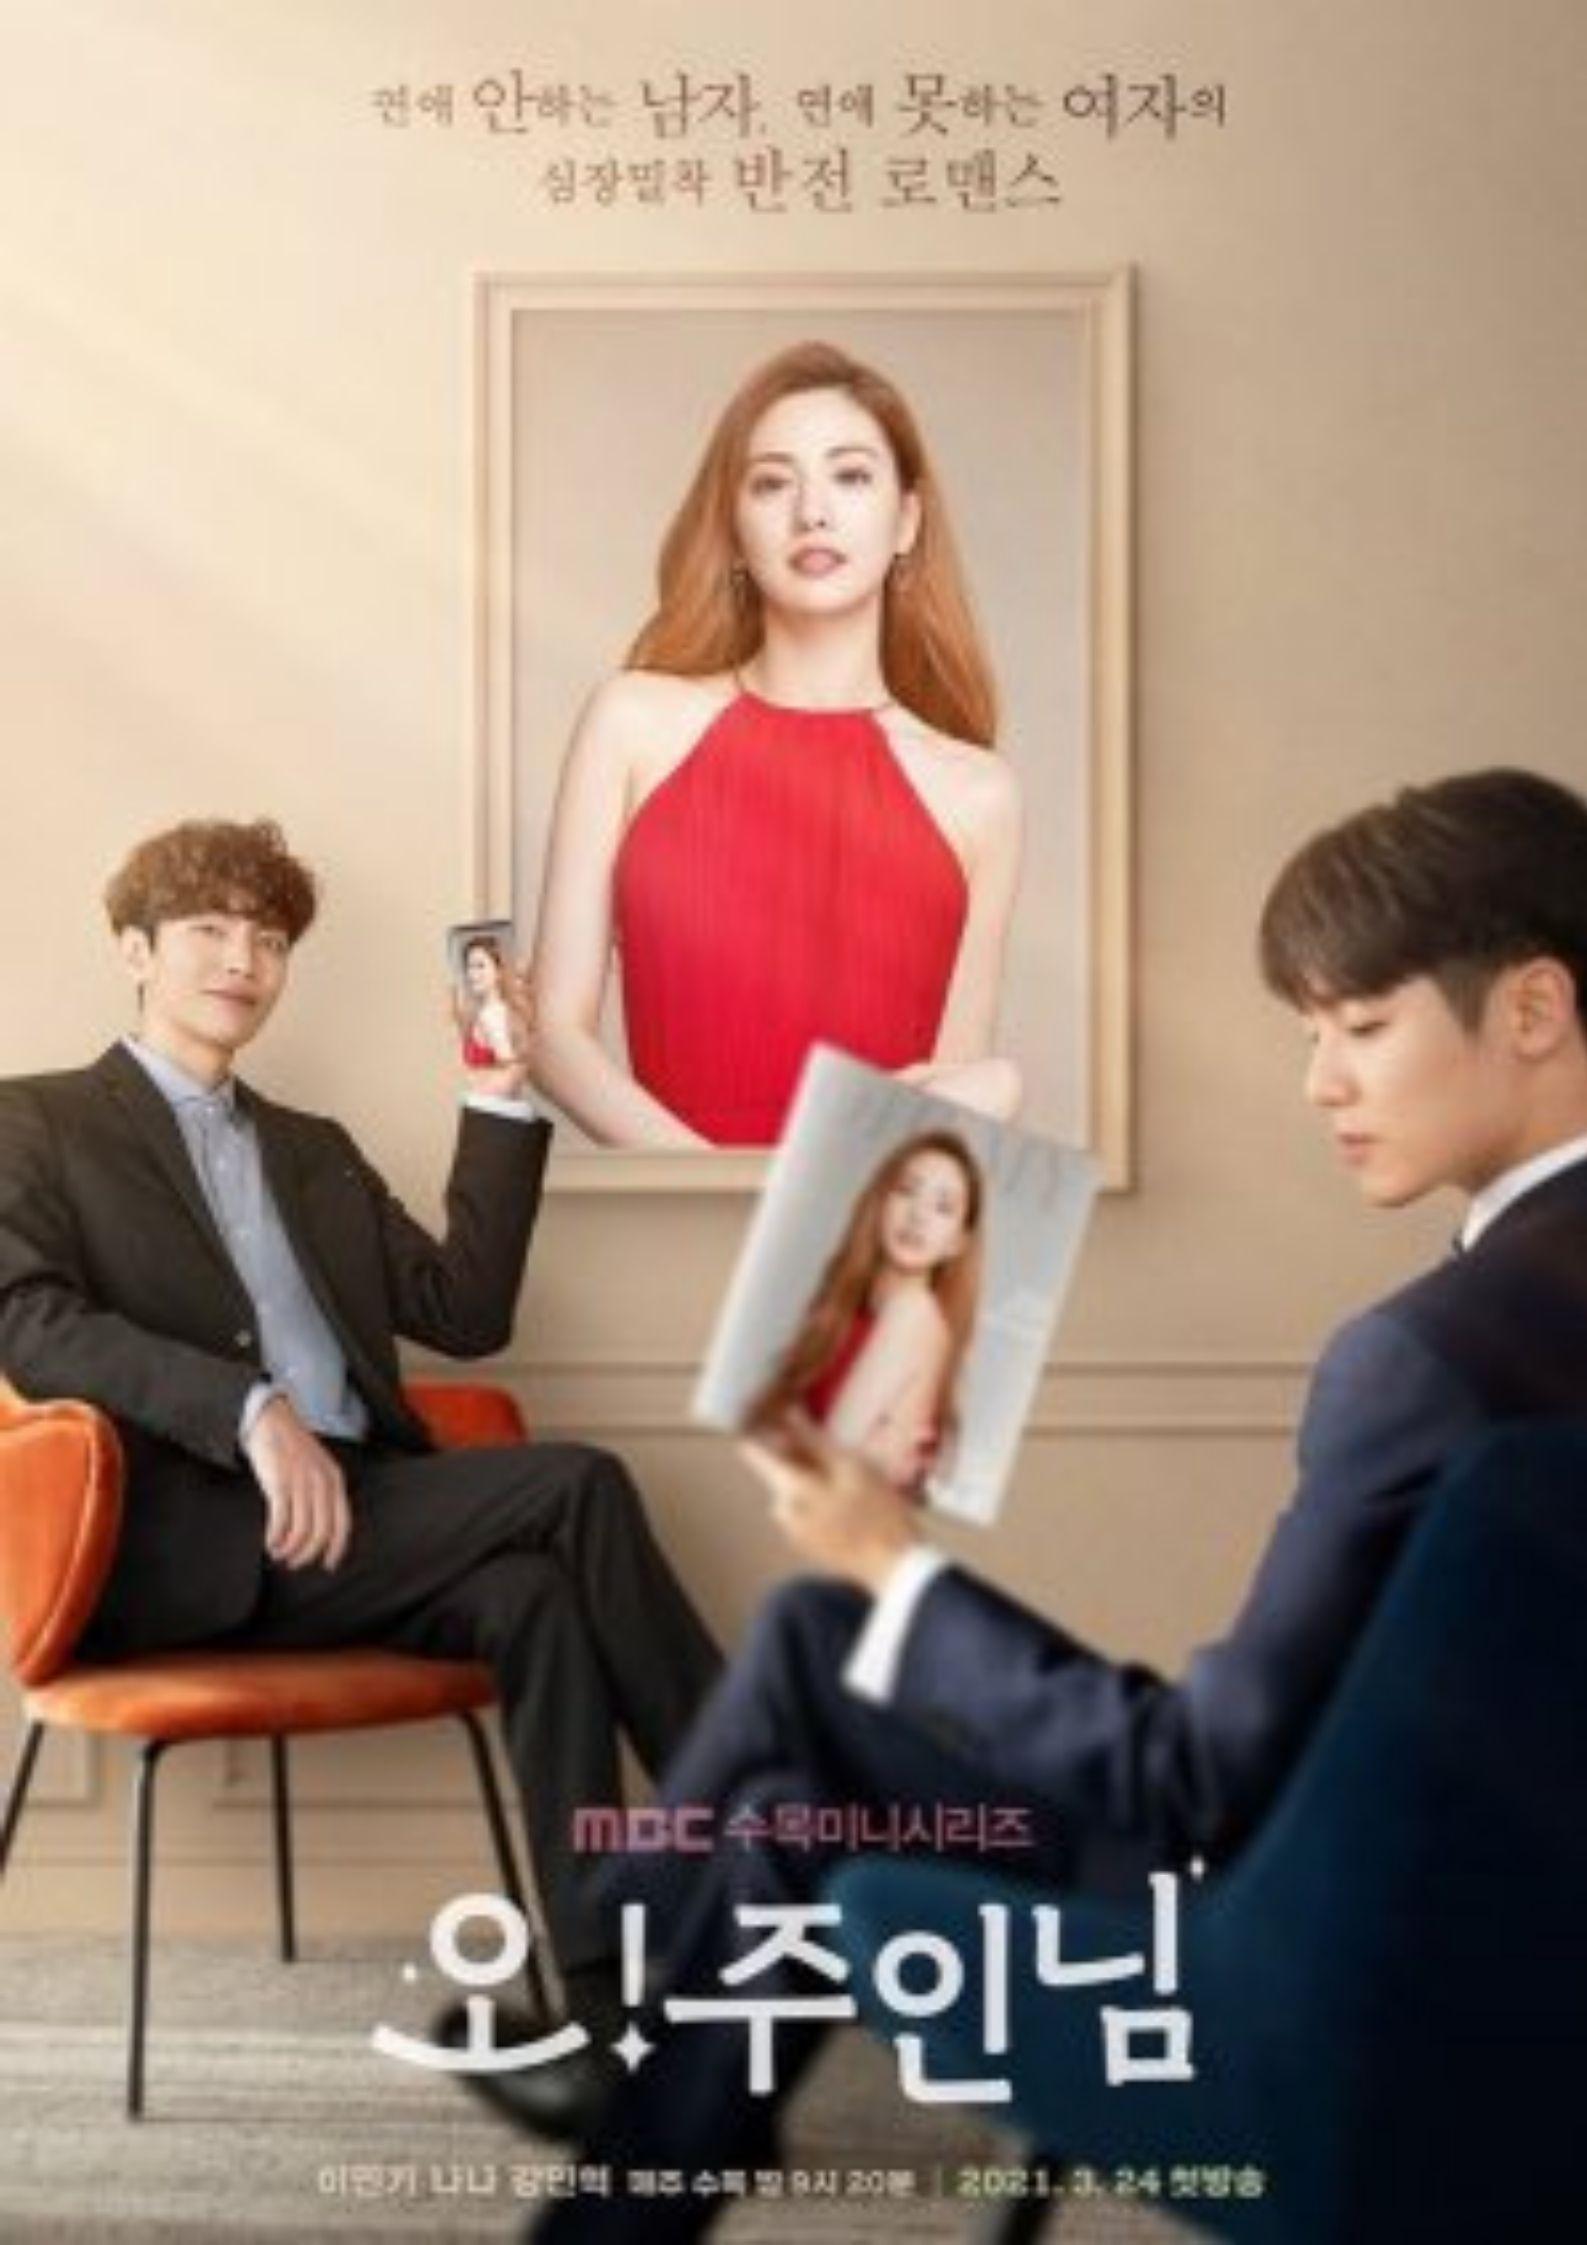 Must-Watch Dramas Starring CNBLUE Members in 2021